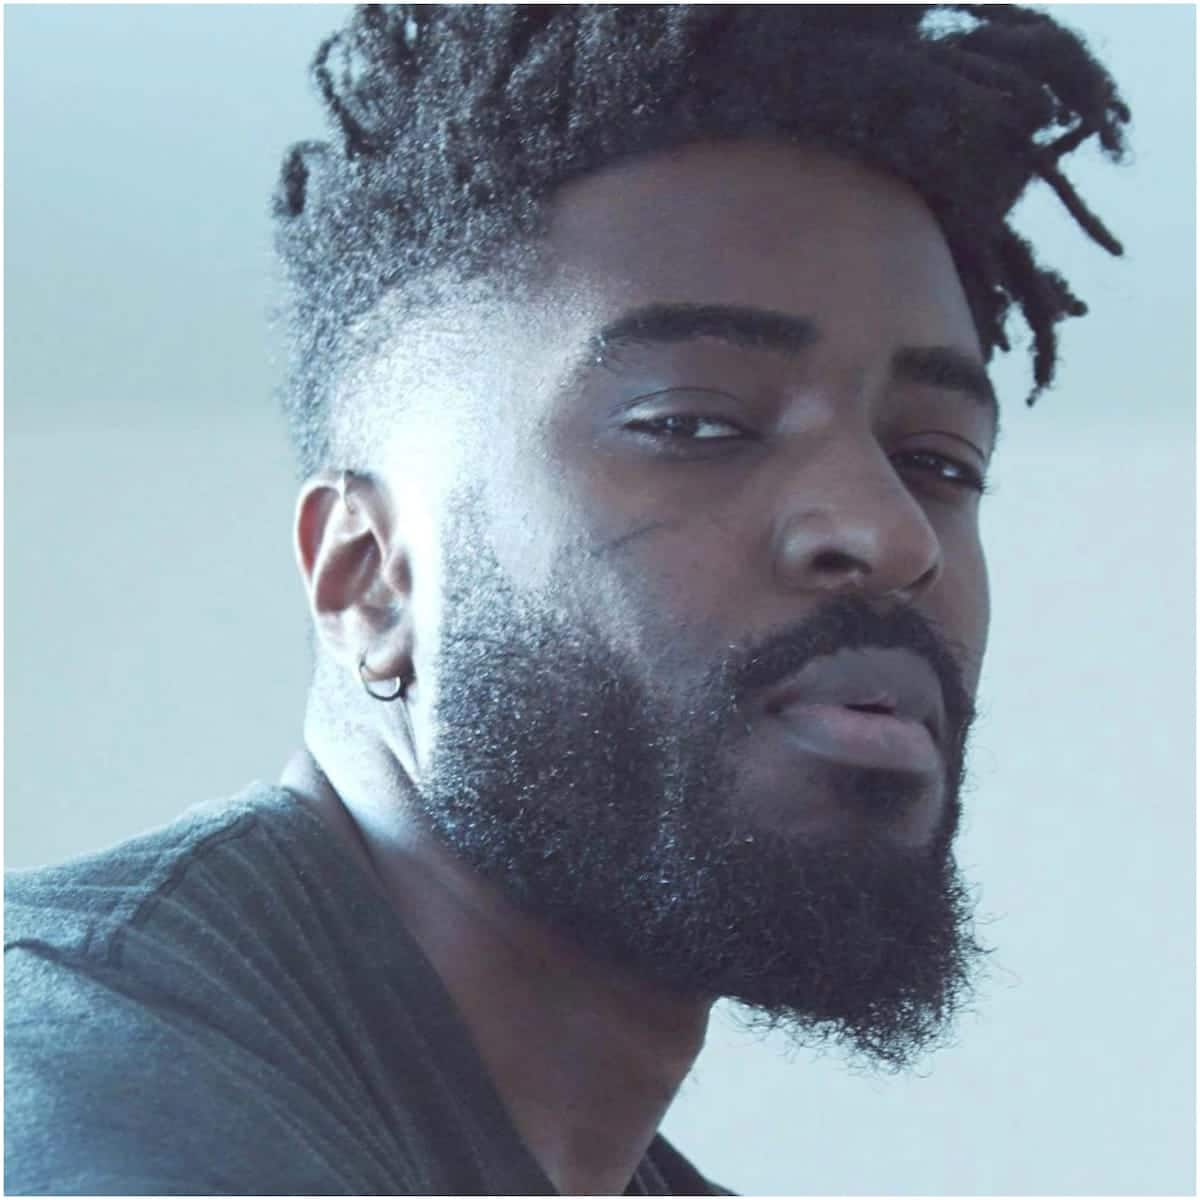 Black men hairstyles for short hair ▷ Tuko.co.ke